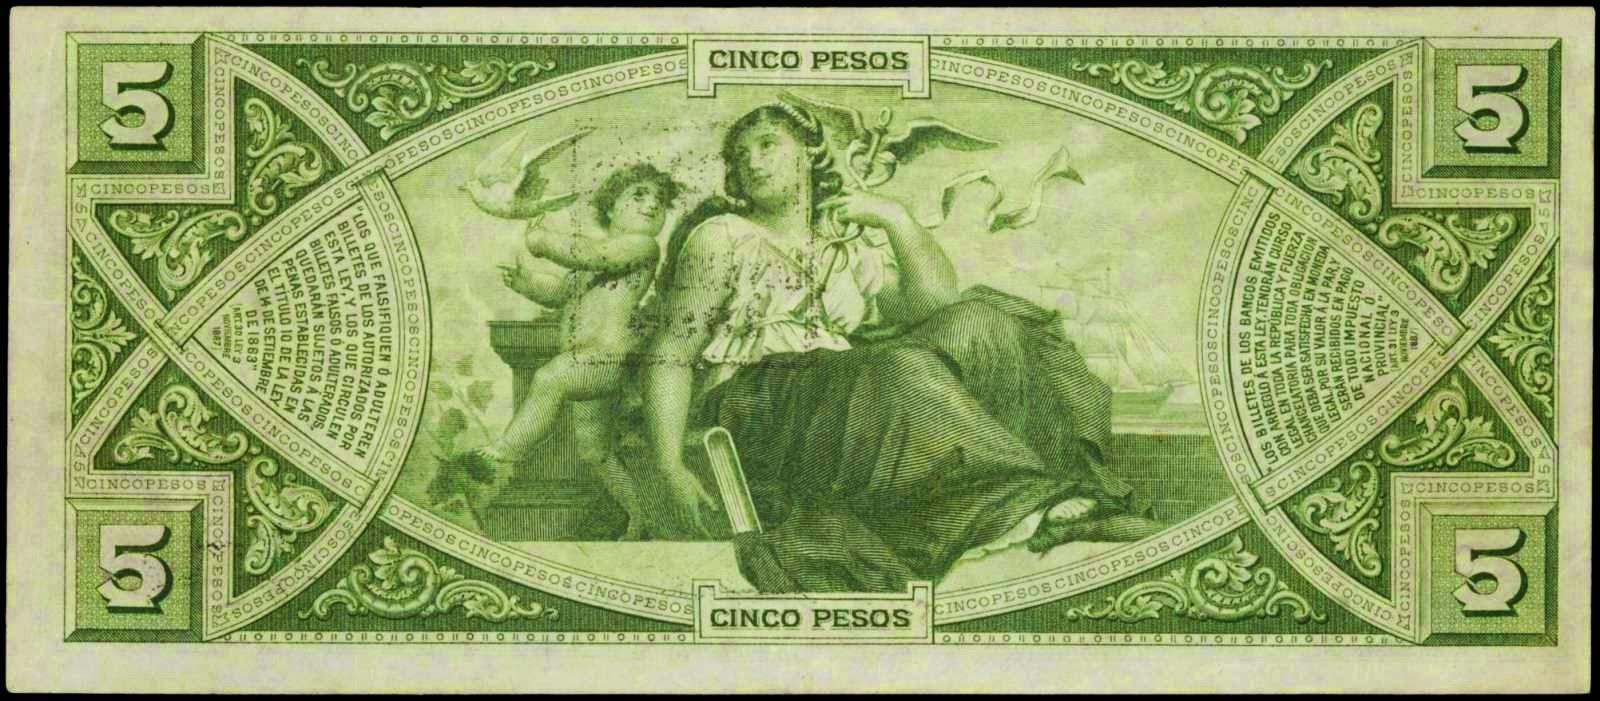 Argentina money 5 Pesos banknote